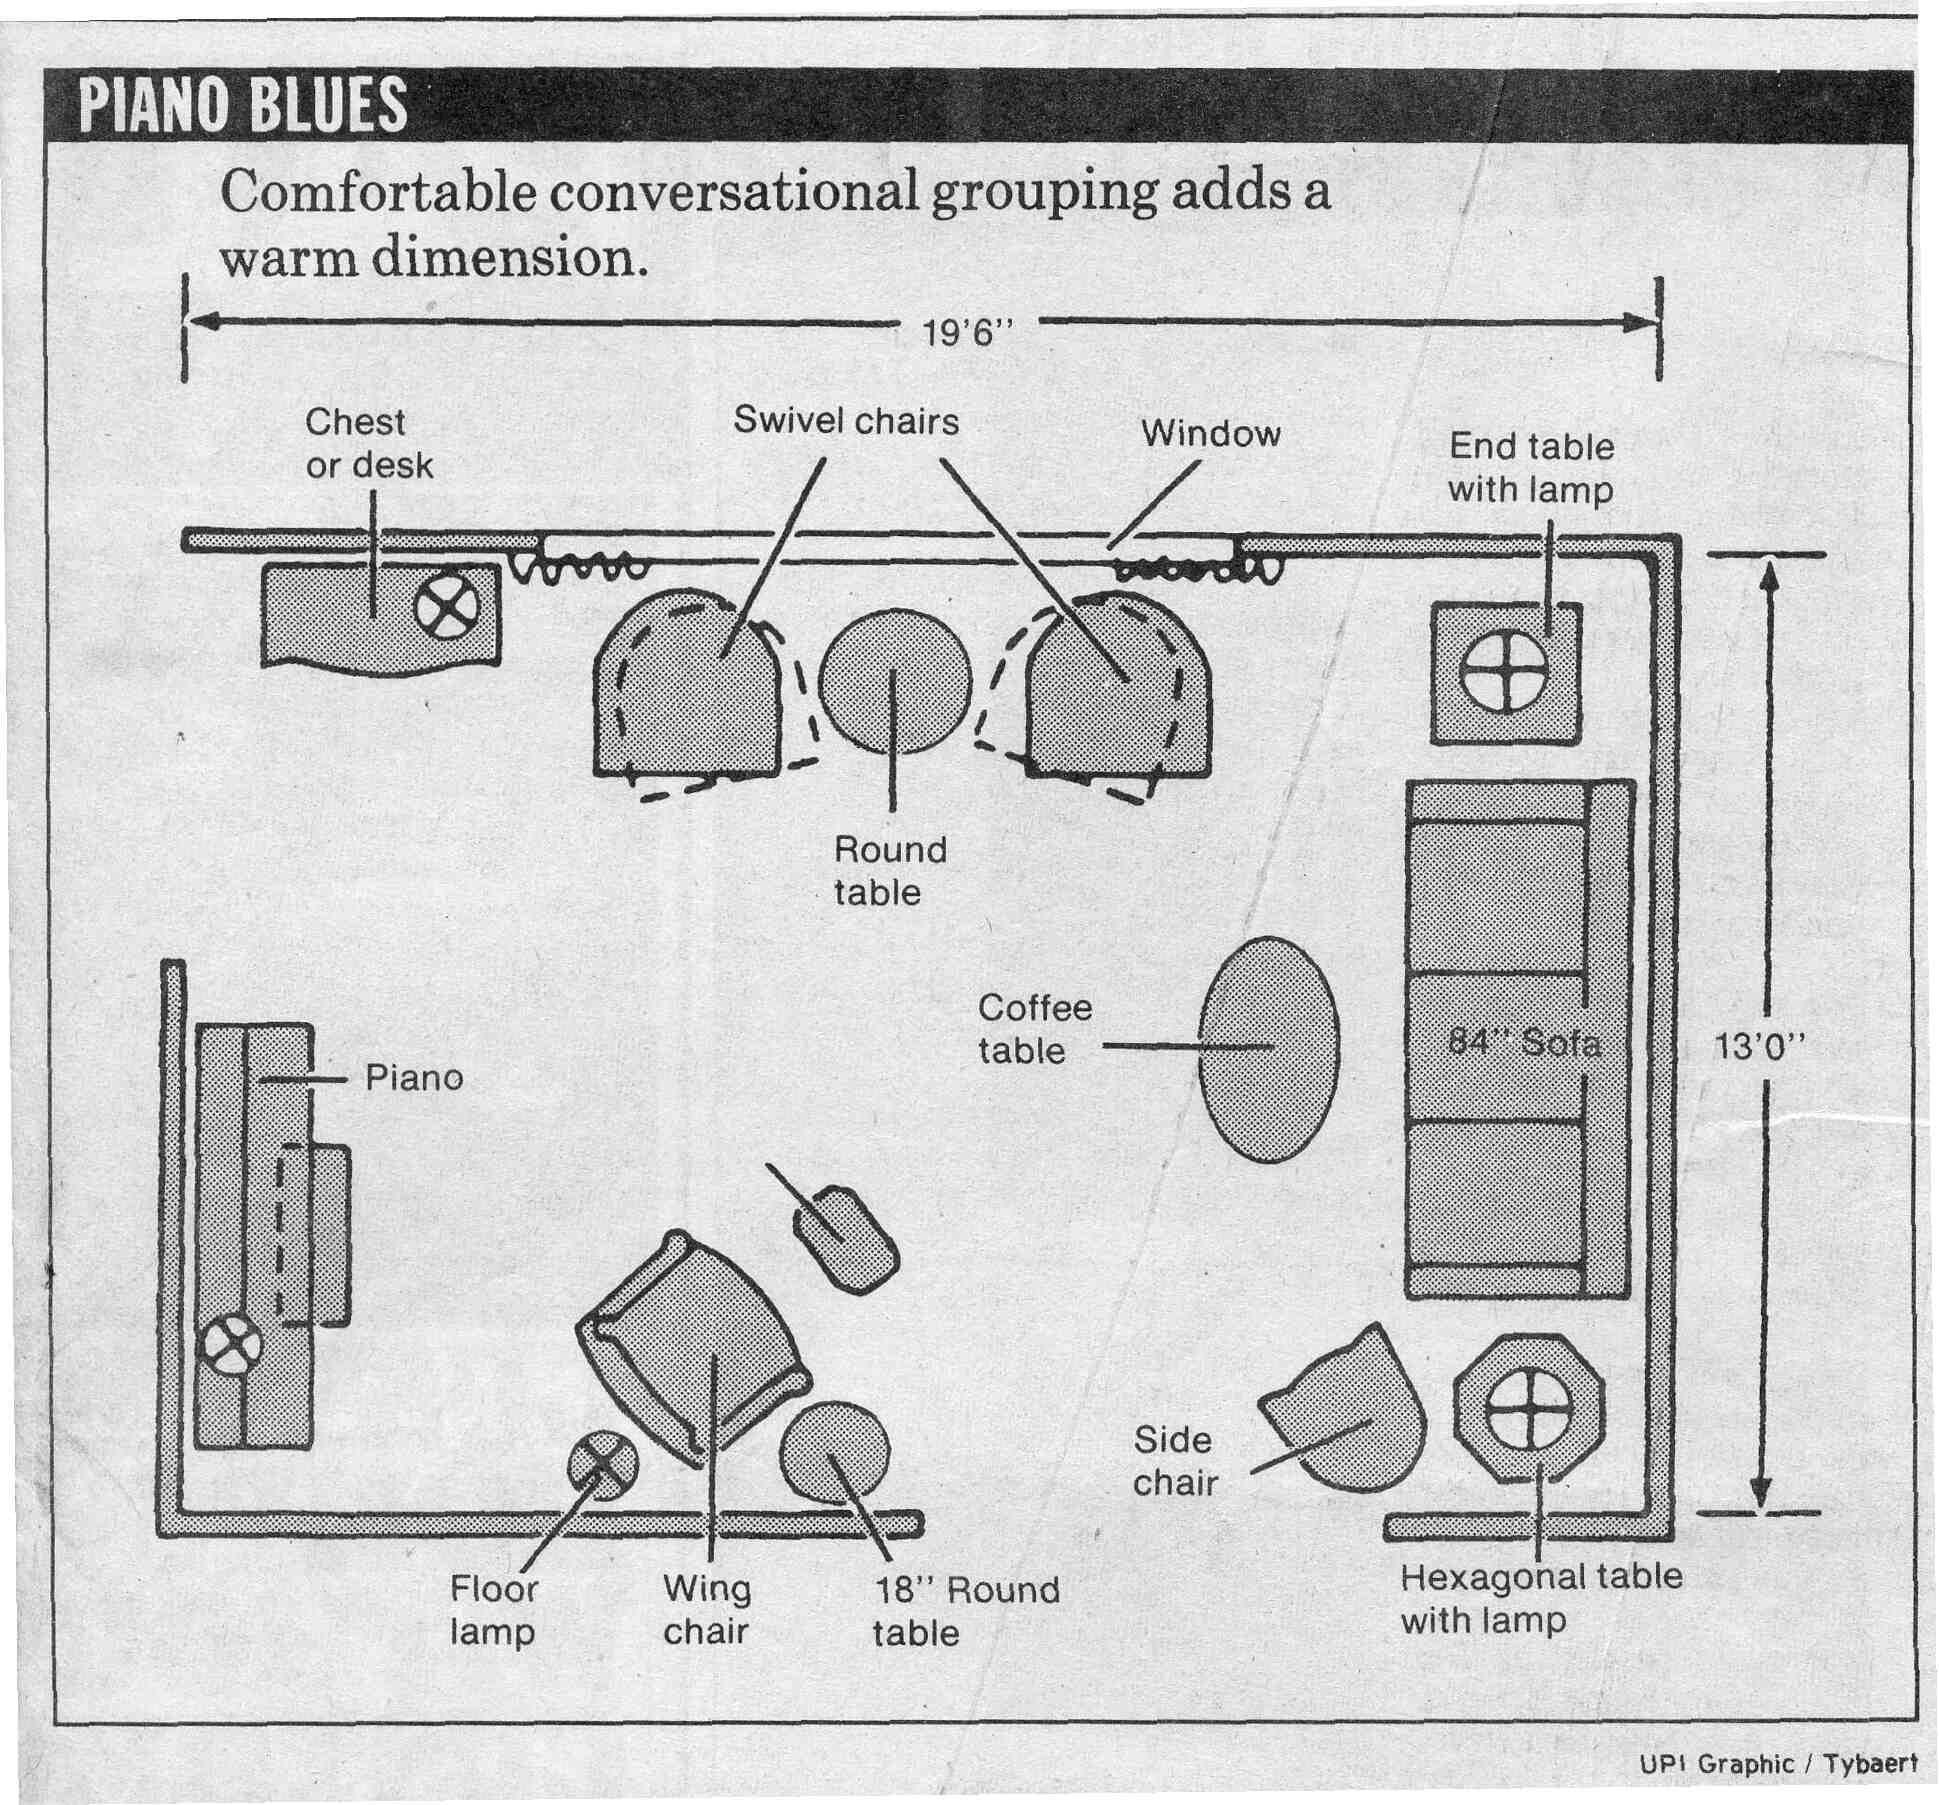 Proper Piano Placement Jpg 1 939 1 805 Pixels Rectangular Living